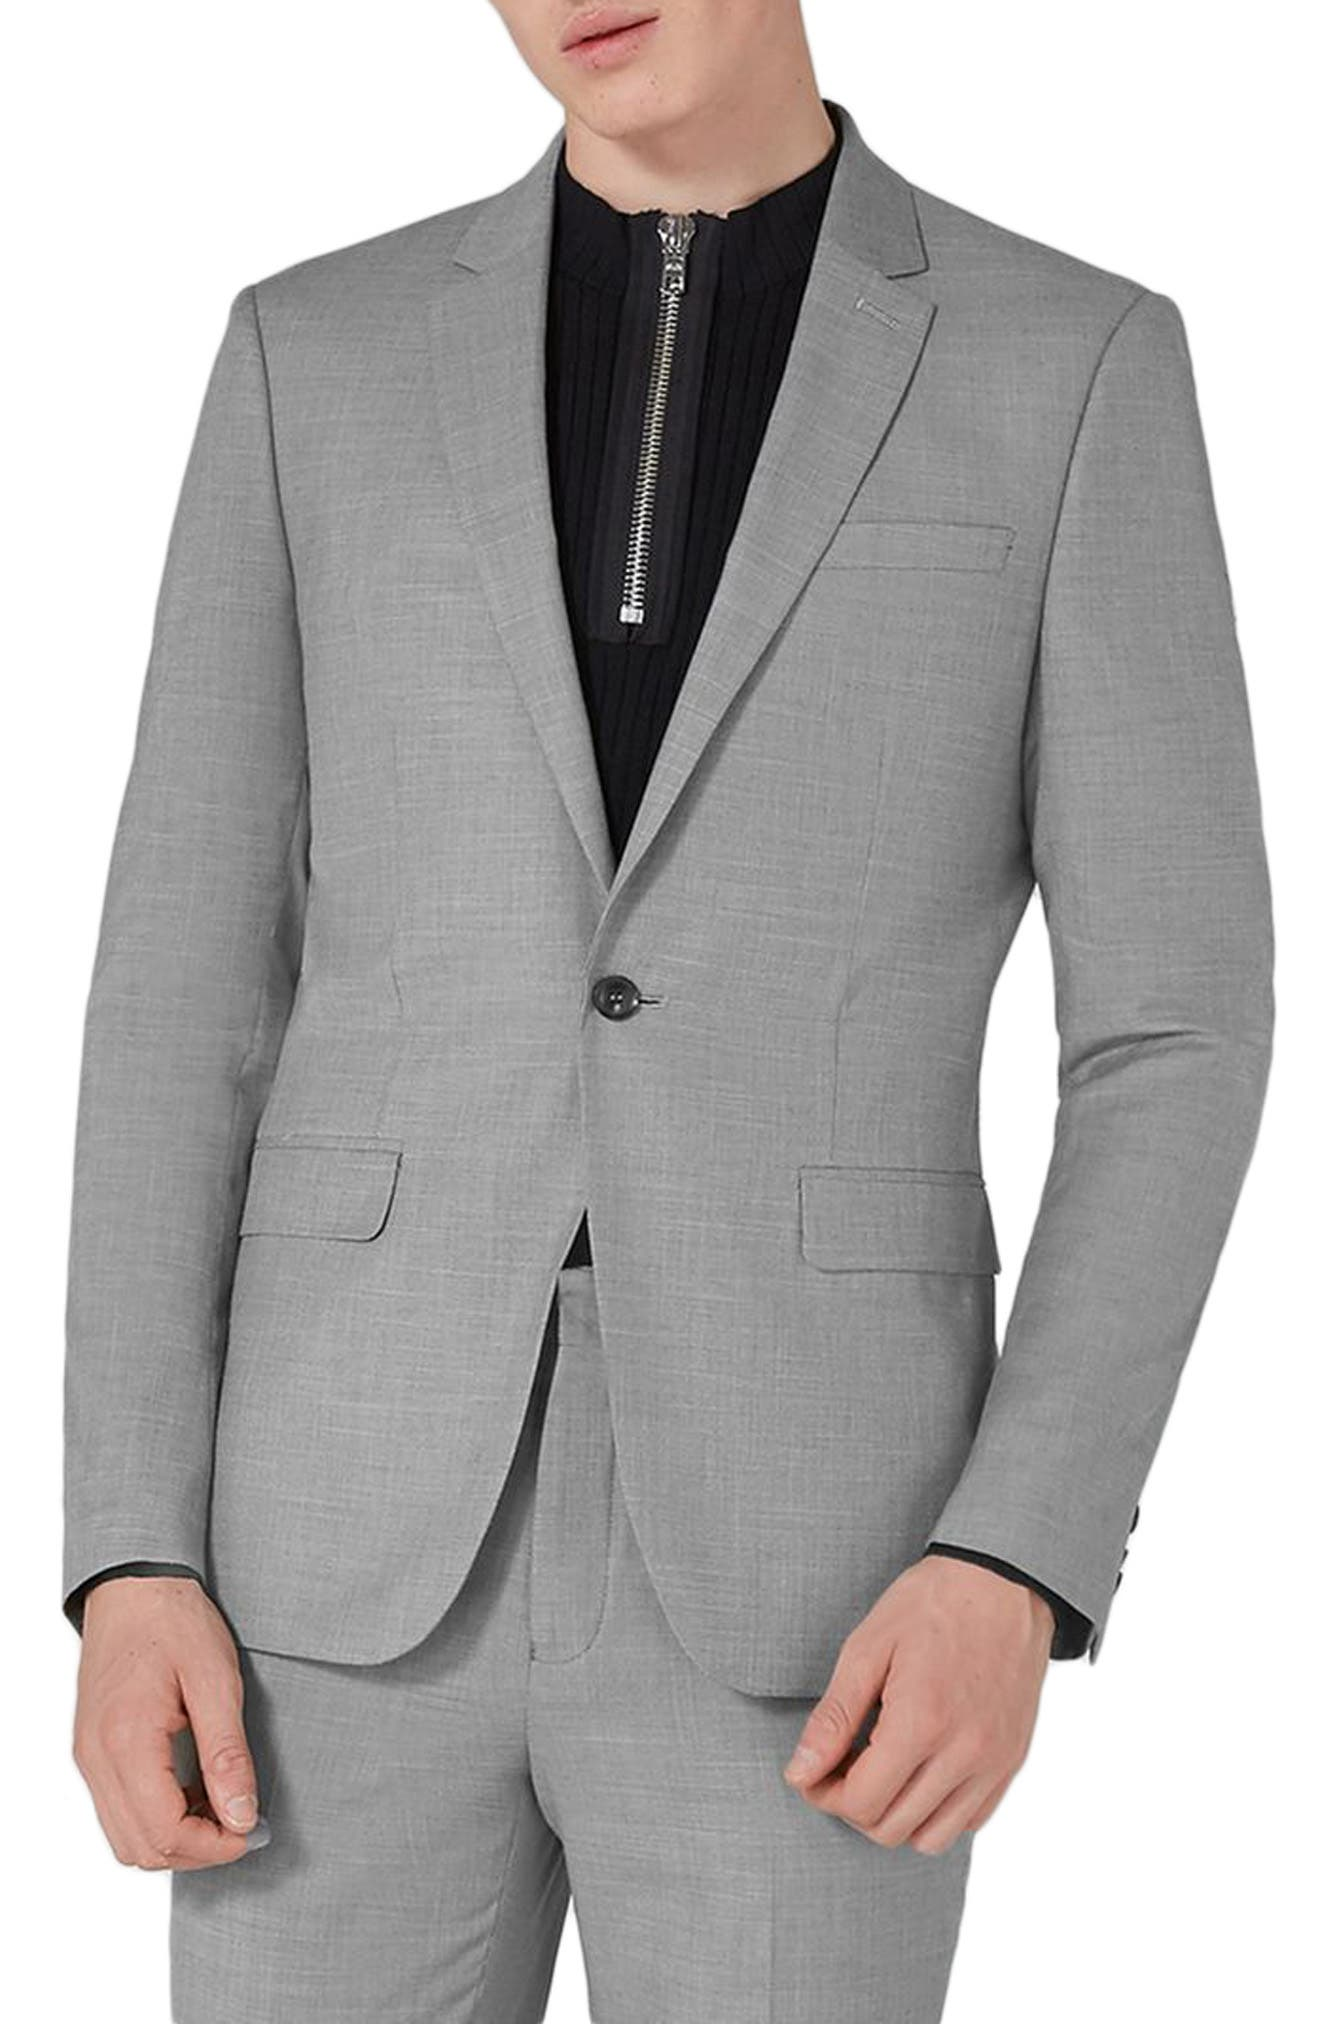 TOPMAN Skinny Fit Suit Jacket, Main, color, GREY